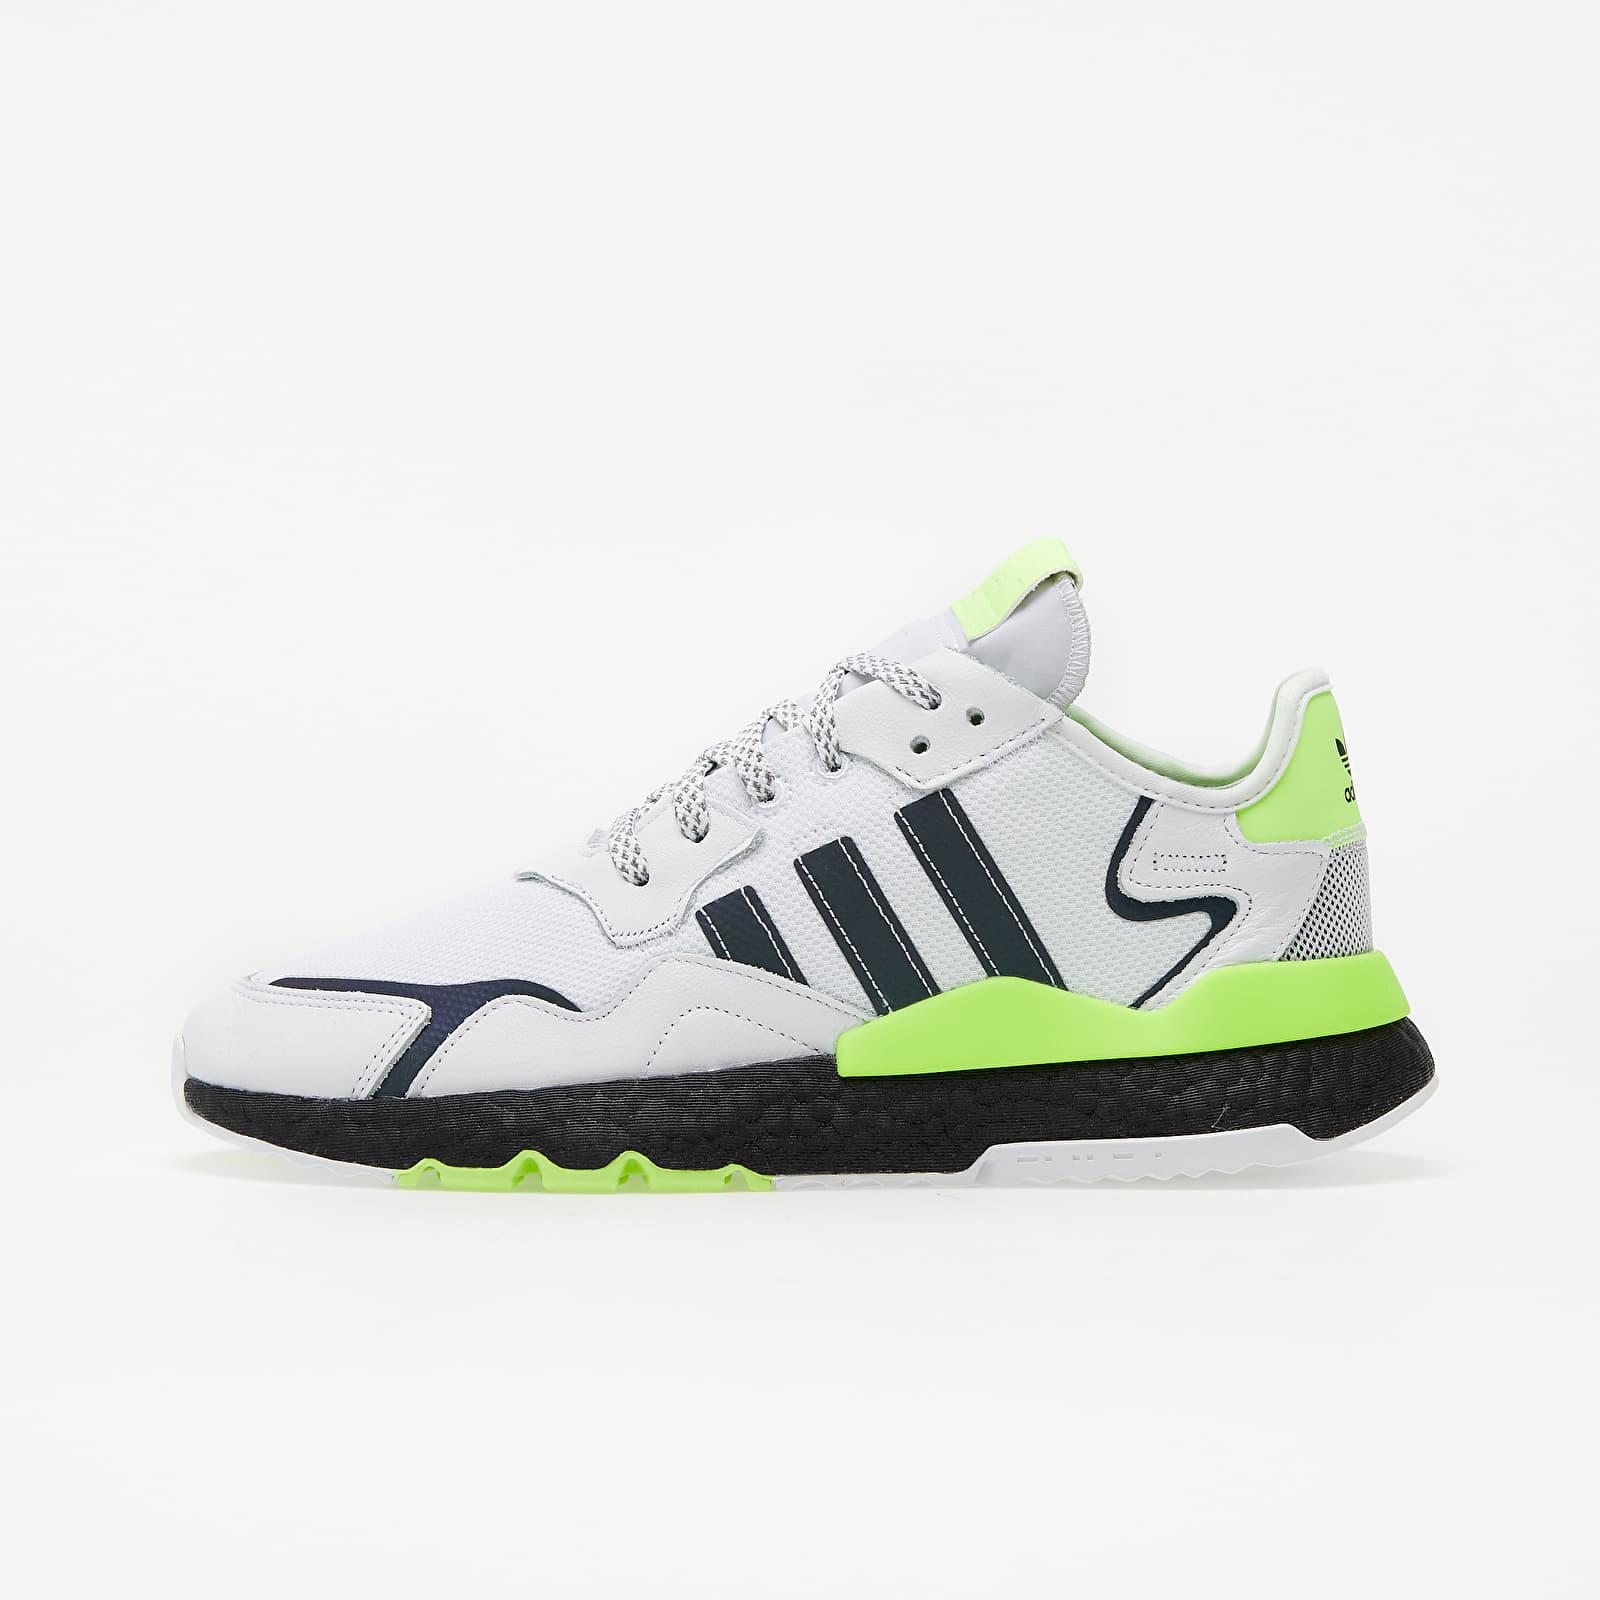 adidas Nite Jogger Ftw White/ Core Black/ Siggnr EUR 47 1/3